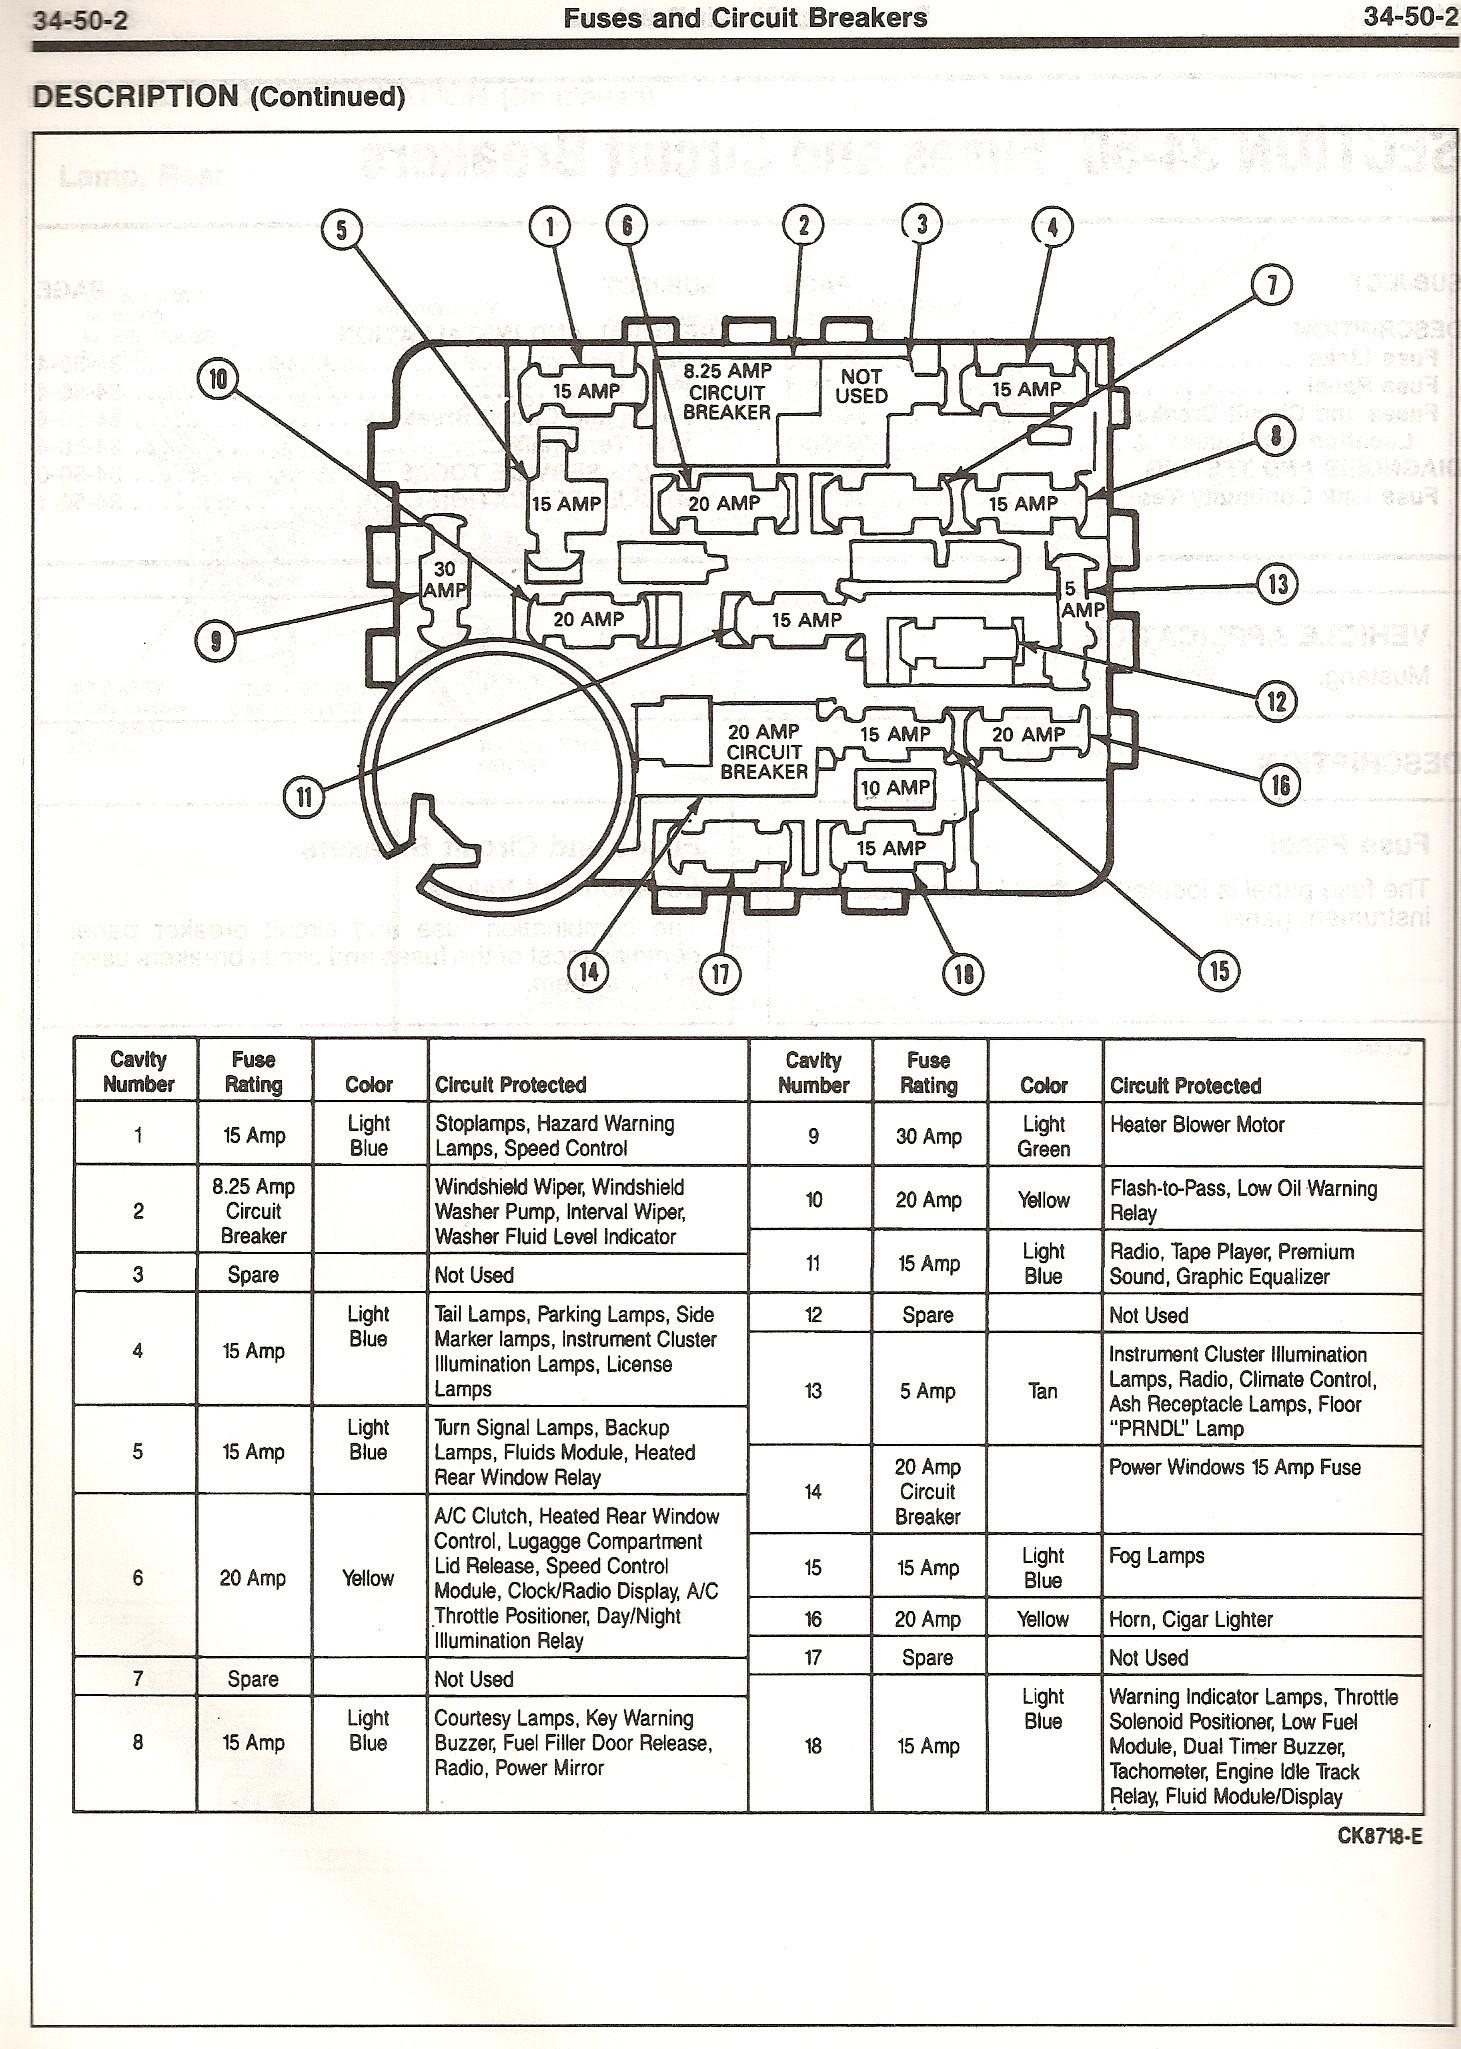 96 Mustang Engine Diagram 1996 Mustang Fuse Panel Diagram Wiring Diagram Used